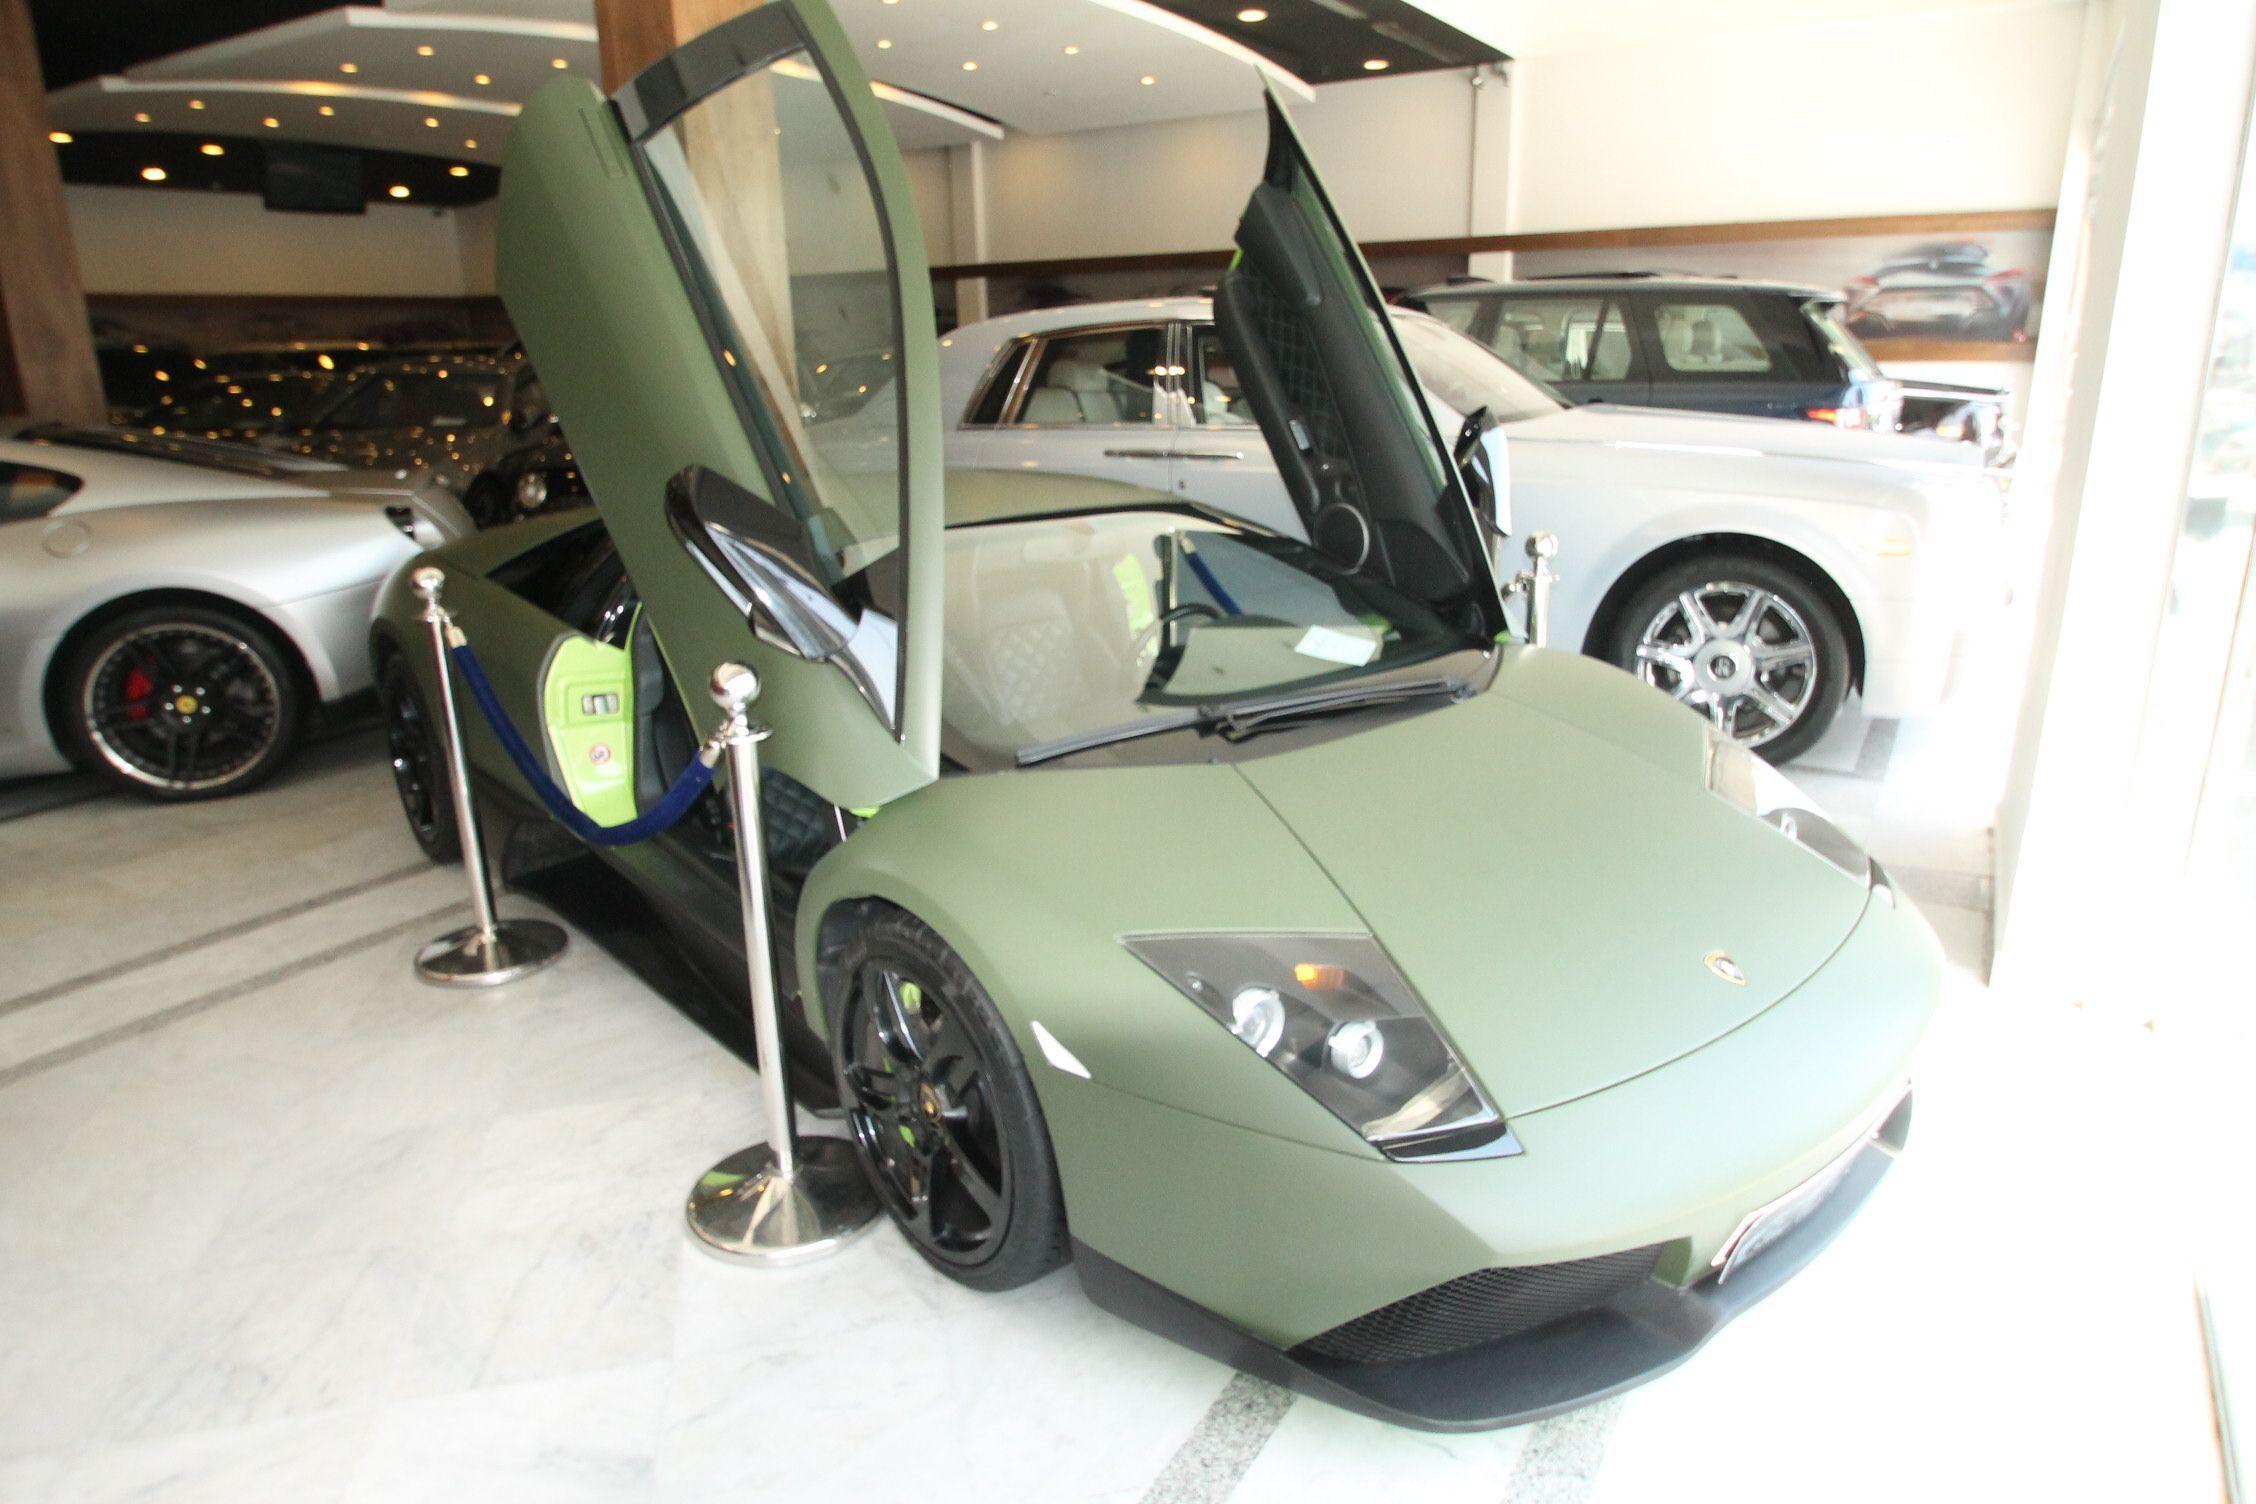 Lamborghini Murcielago For Sale In Jeddah